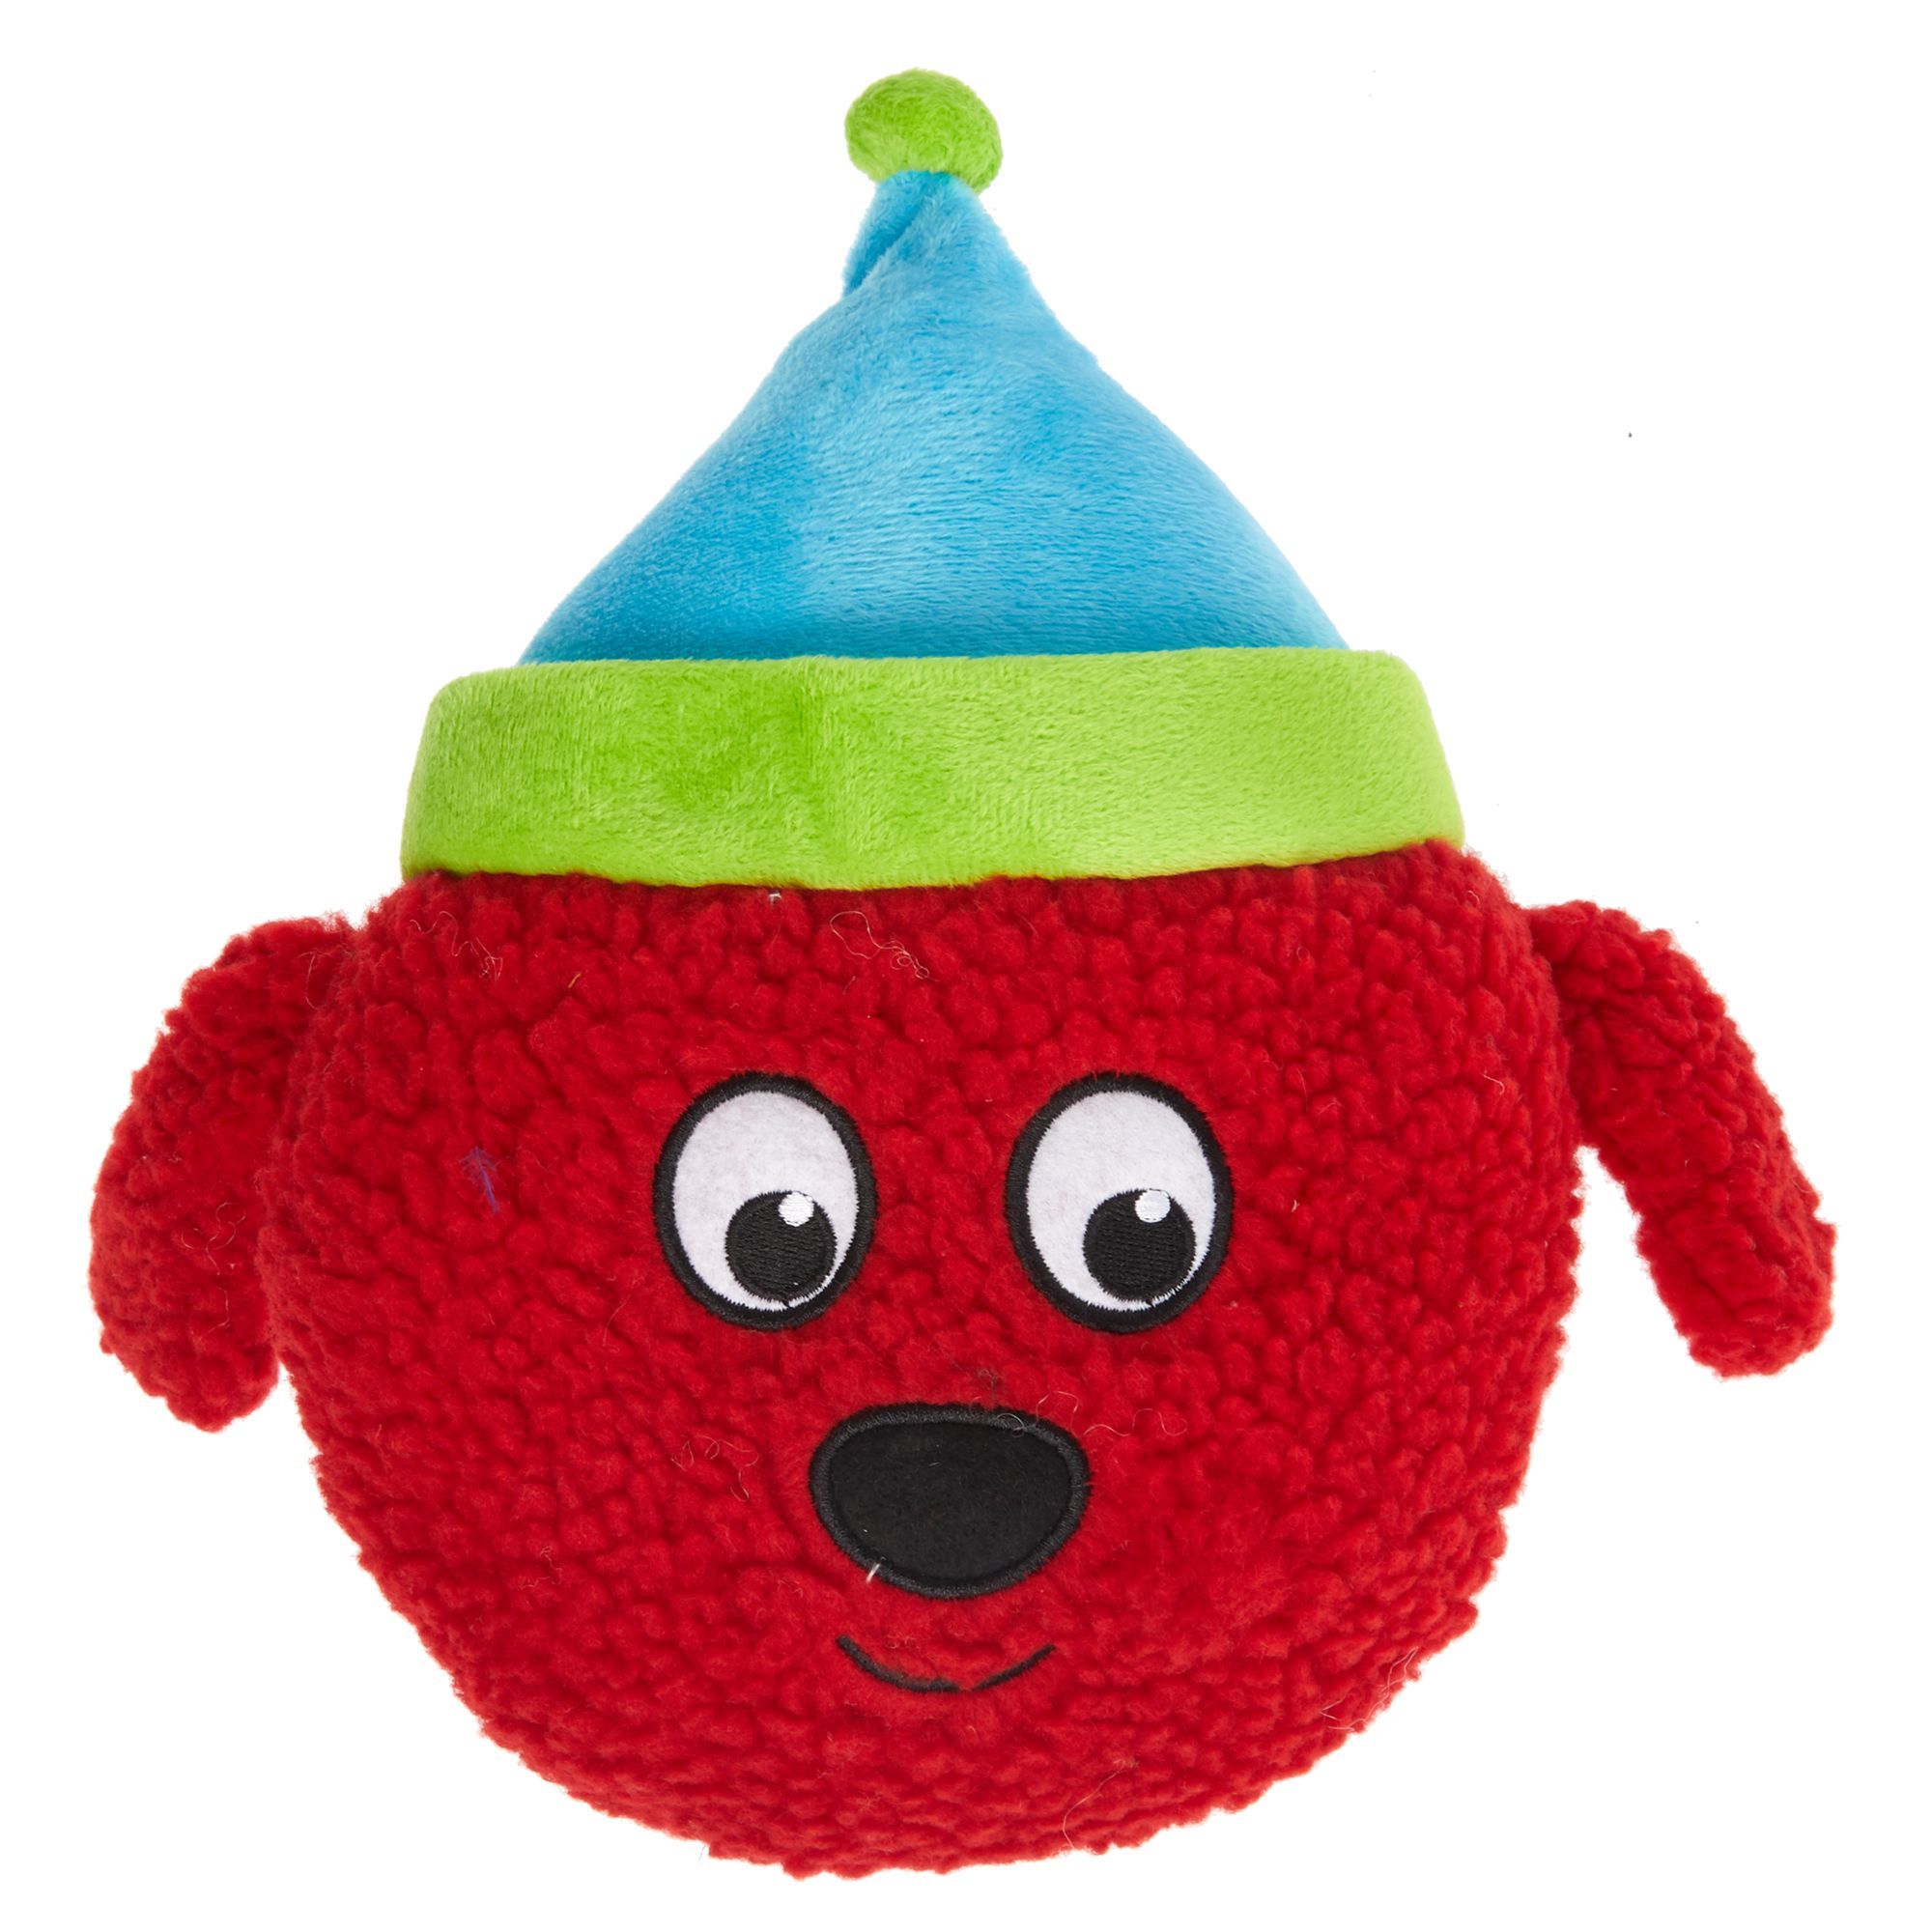 Pet Holiday, Dog Head Dog Toy - Plush, Squeaker 5270800